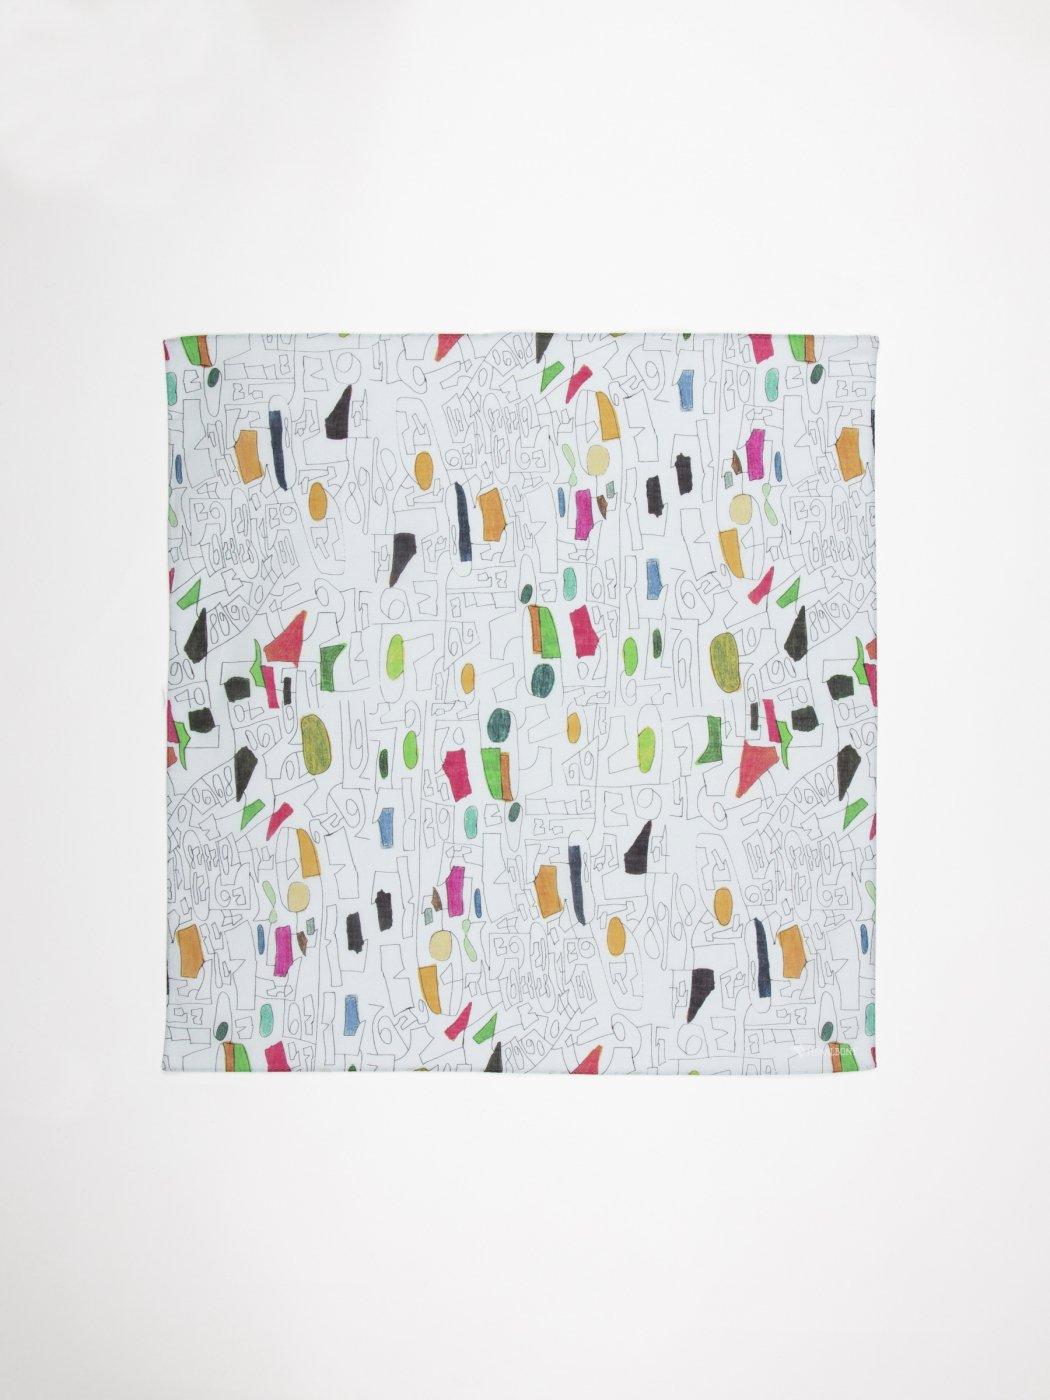 HERALBONY -ART HANDKERCHIEF- Satoru Kobayashi -figure数字(FIGURE)-